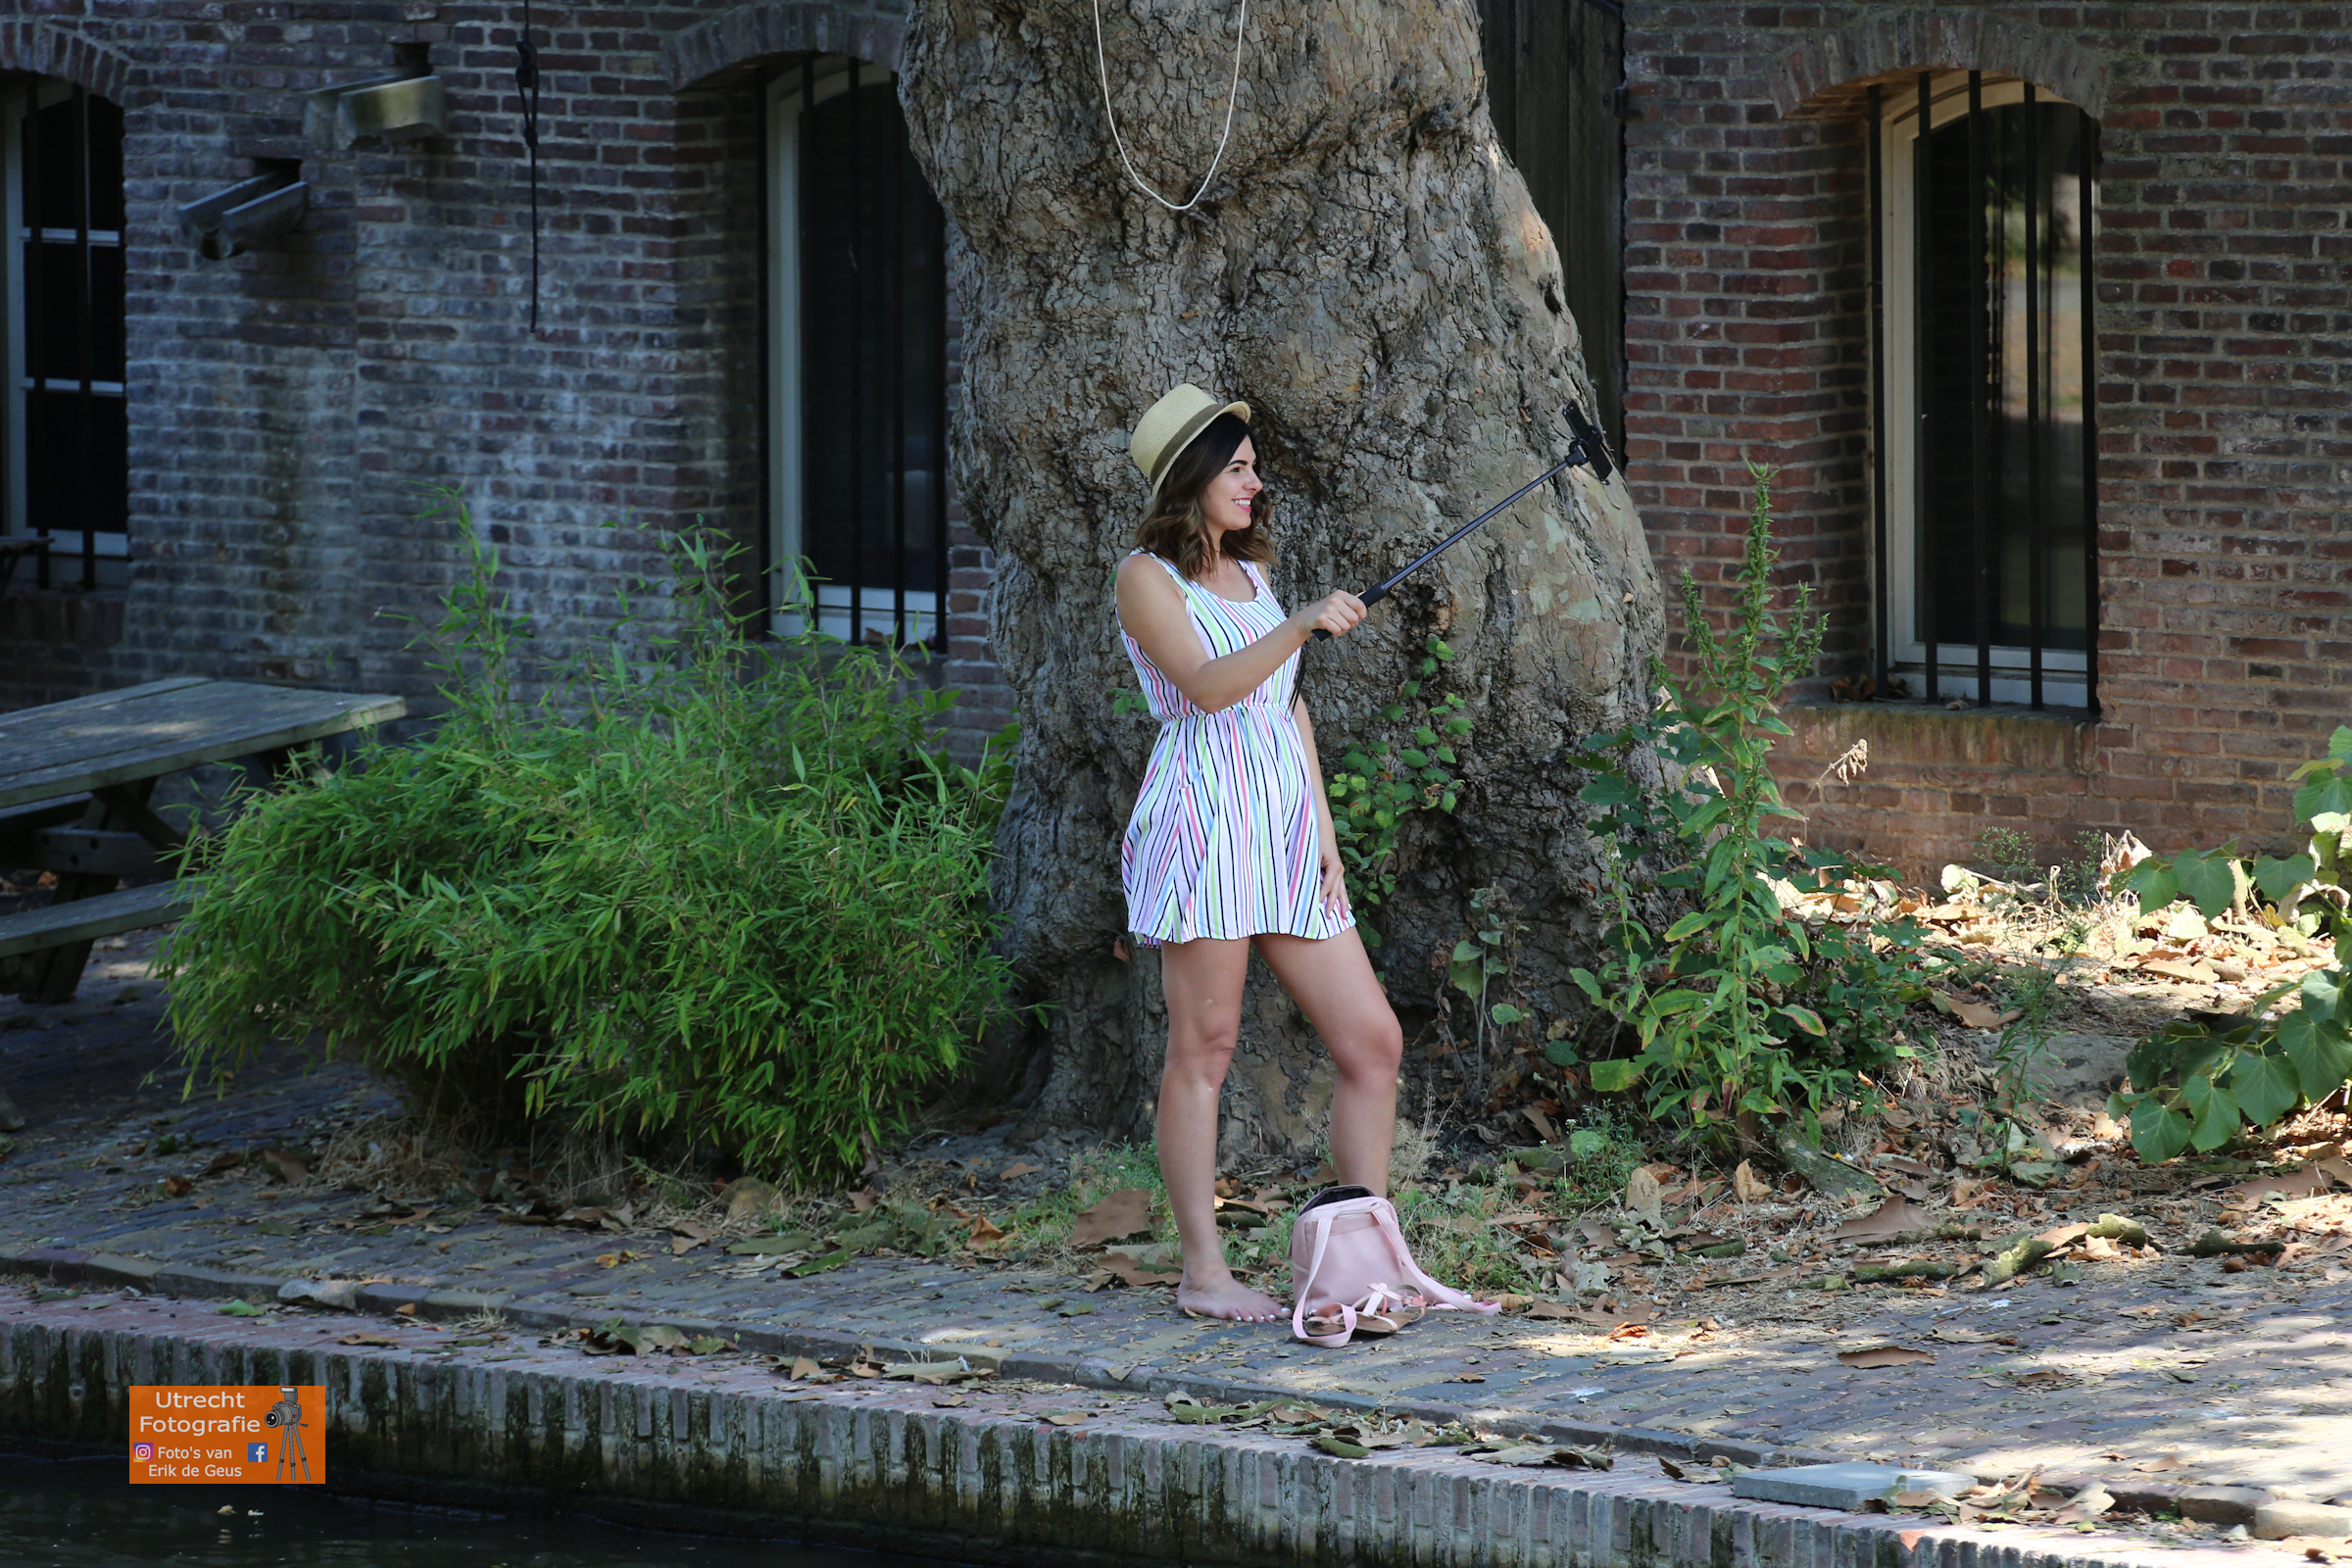 20180727 Oudegracht Selfie 01